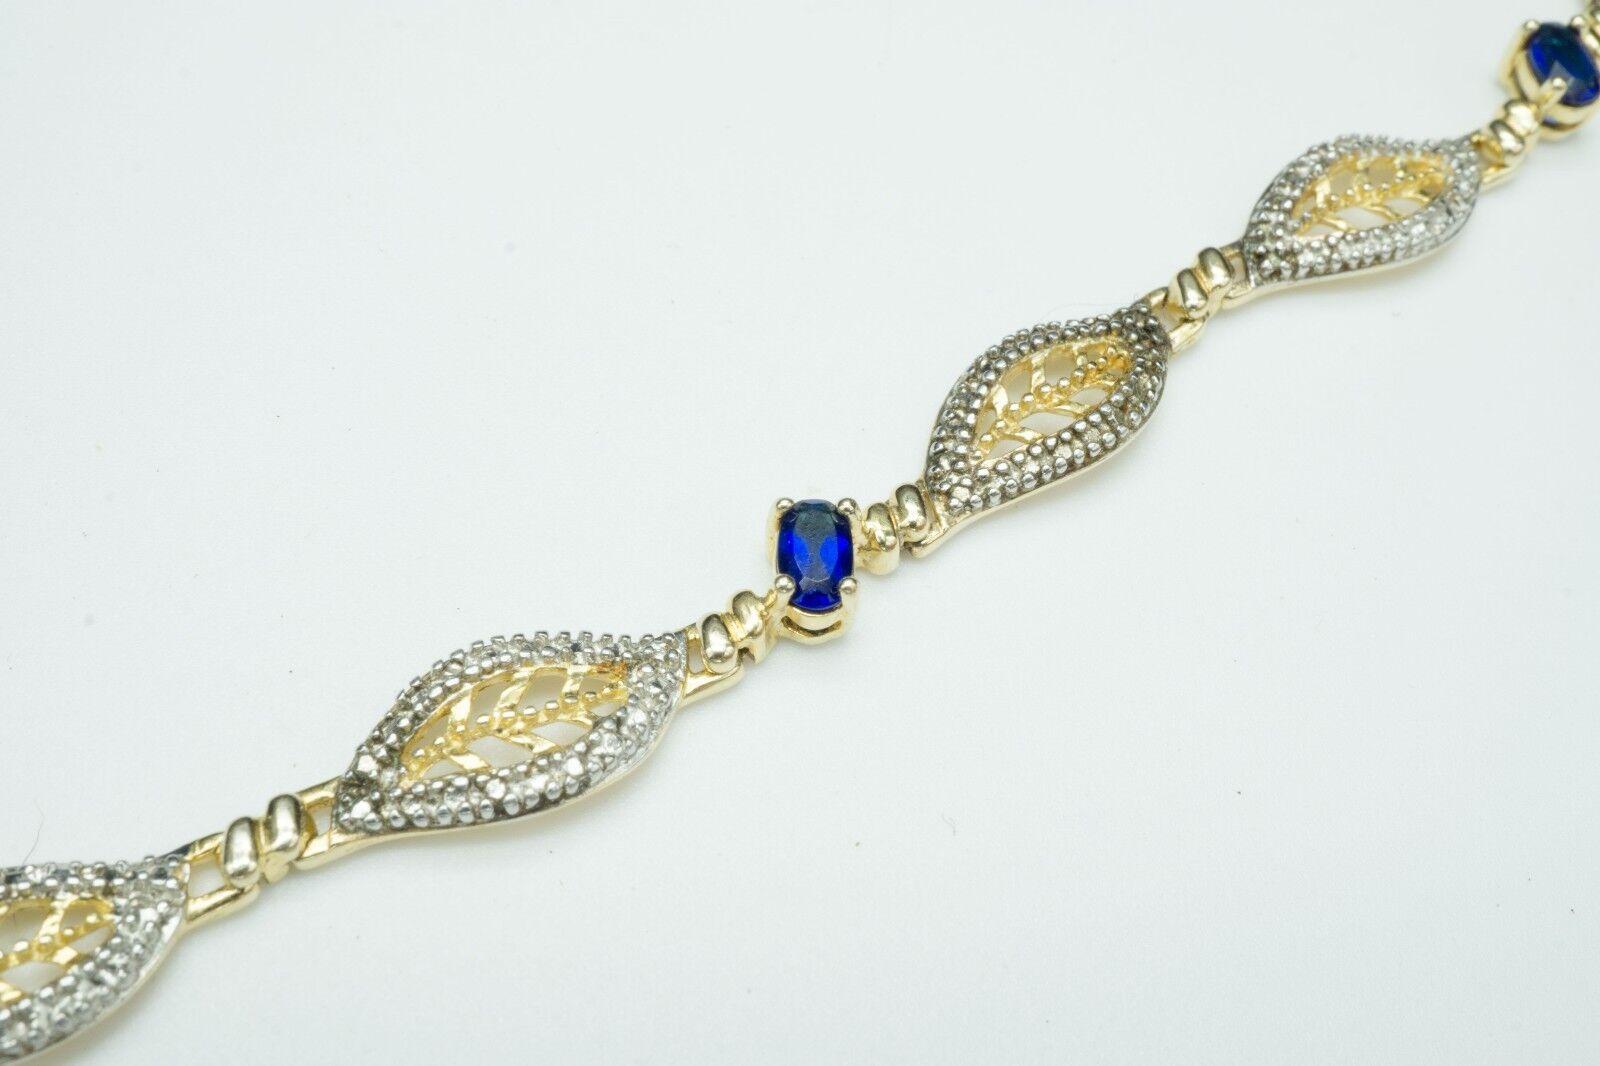 gold Plated .925 & Sapphire   Bracelet   Beautiful Intricate Design   Size 7(8g)